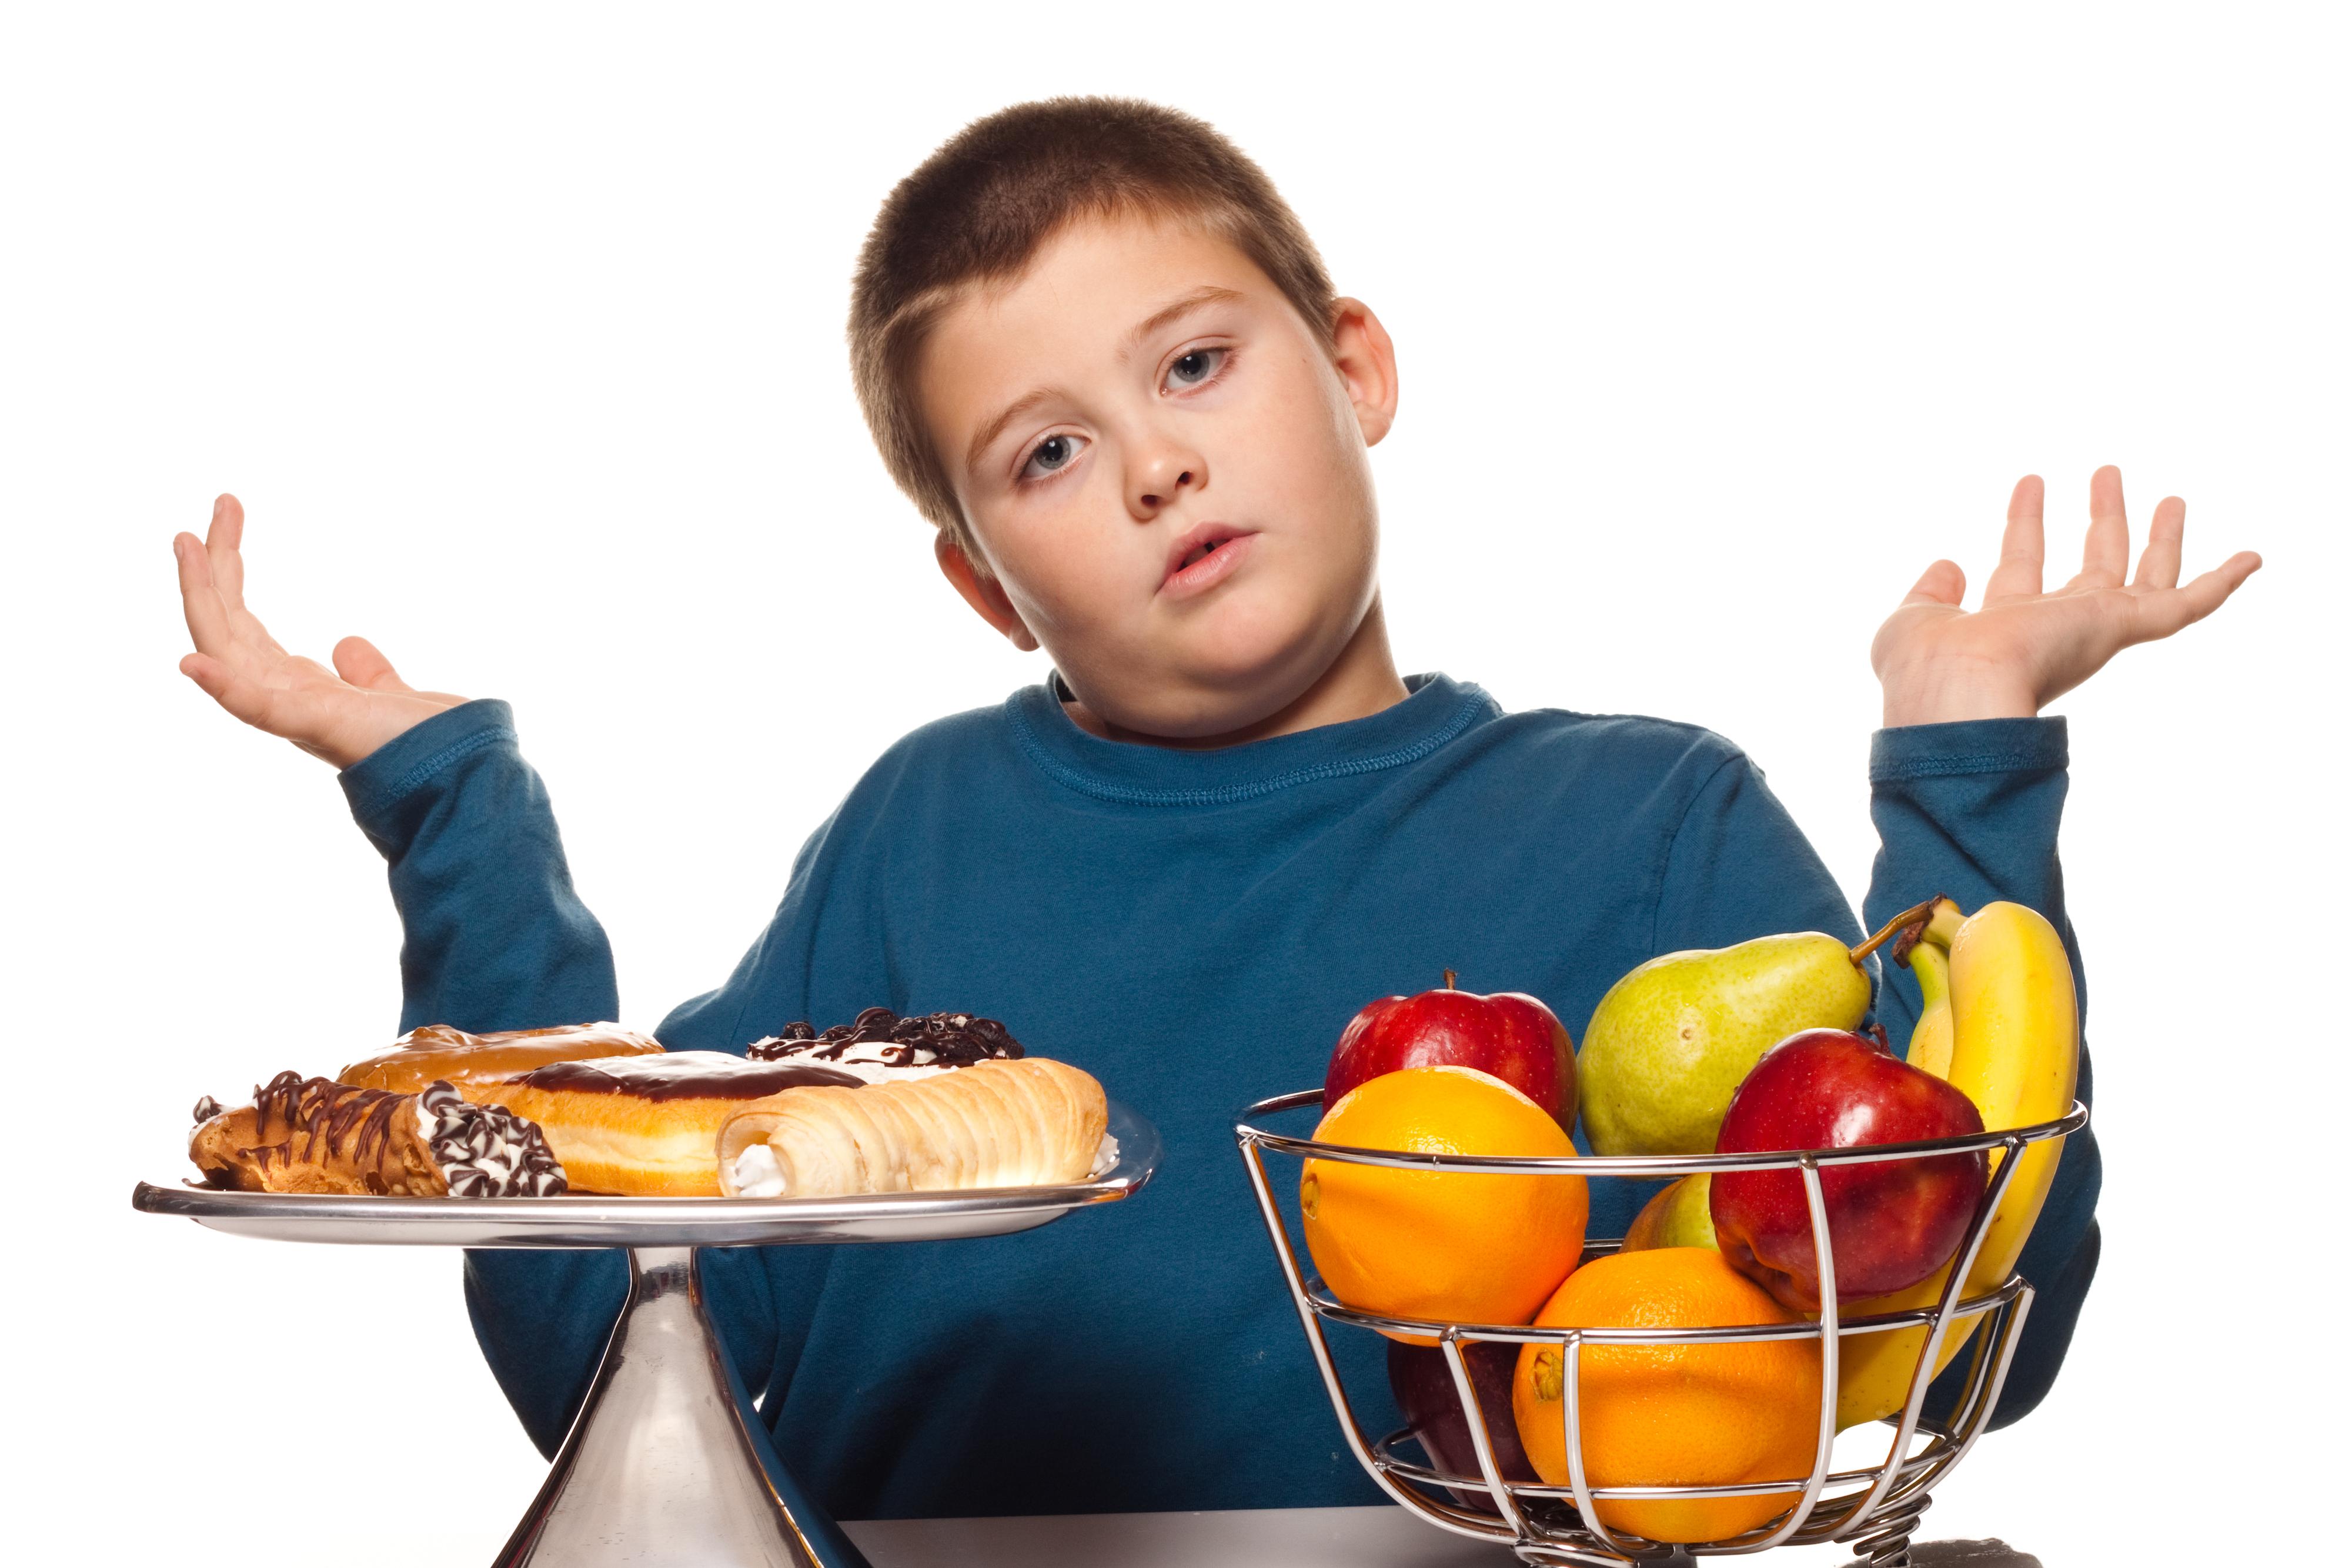 bigstock-A-Boy-s-Choice-Of-A-Healthy-Or-11030450